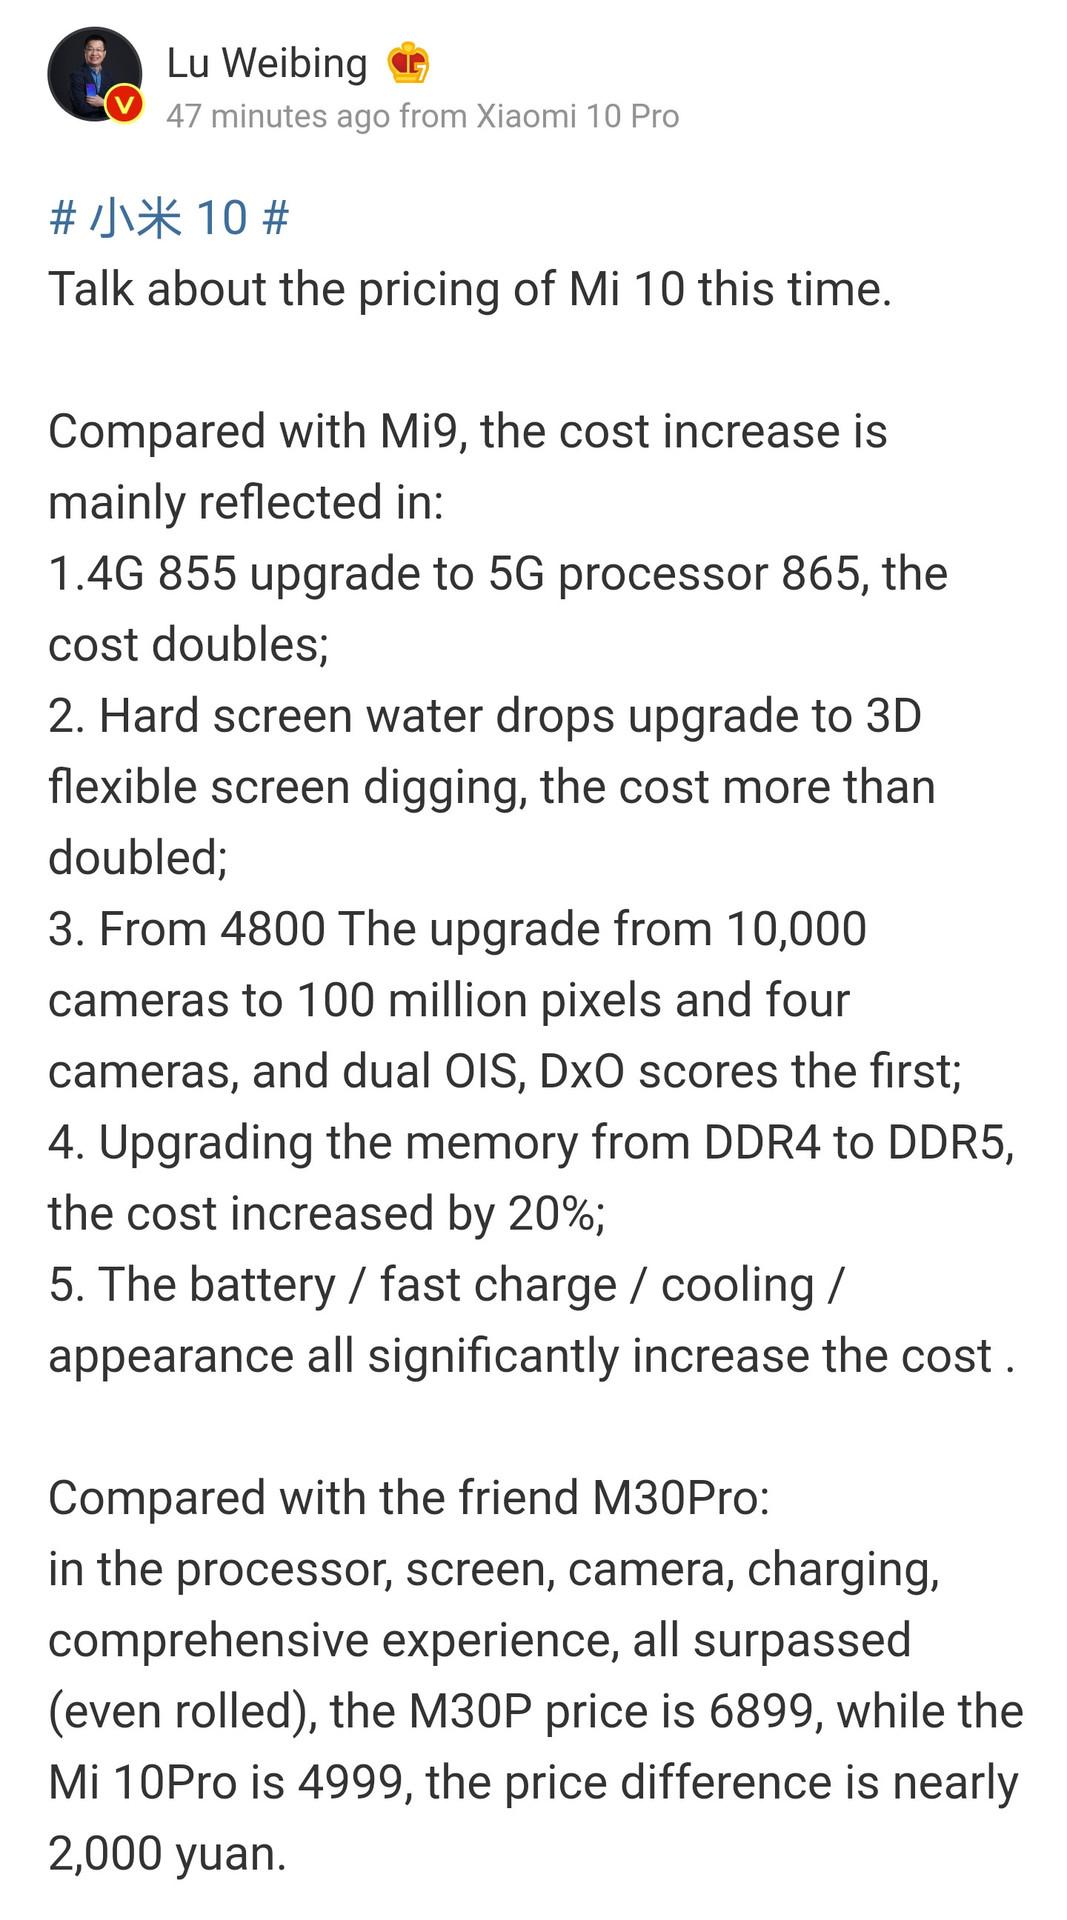 Xiaomi executive Lu Weibing talks about the Mi 10 pricing.